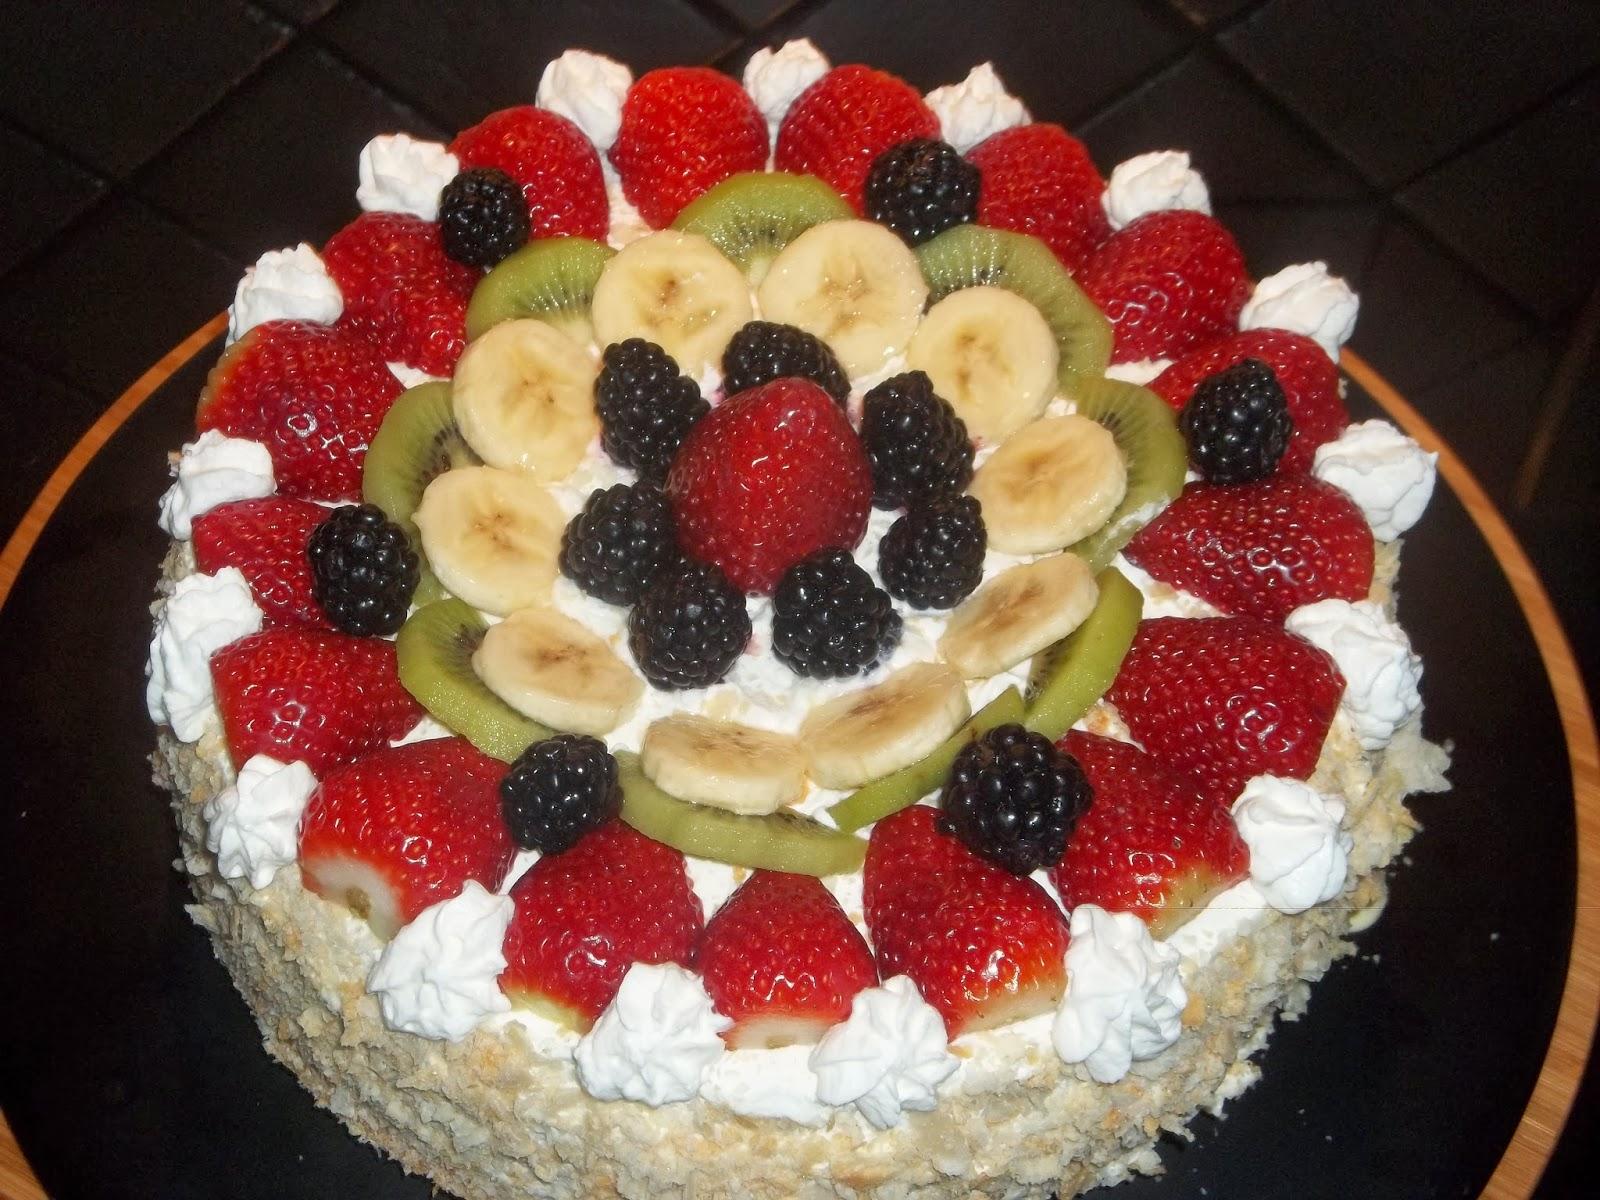 .. torta alla frutta fresca con crema chantilly ..